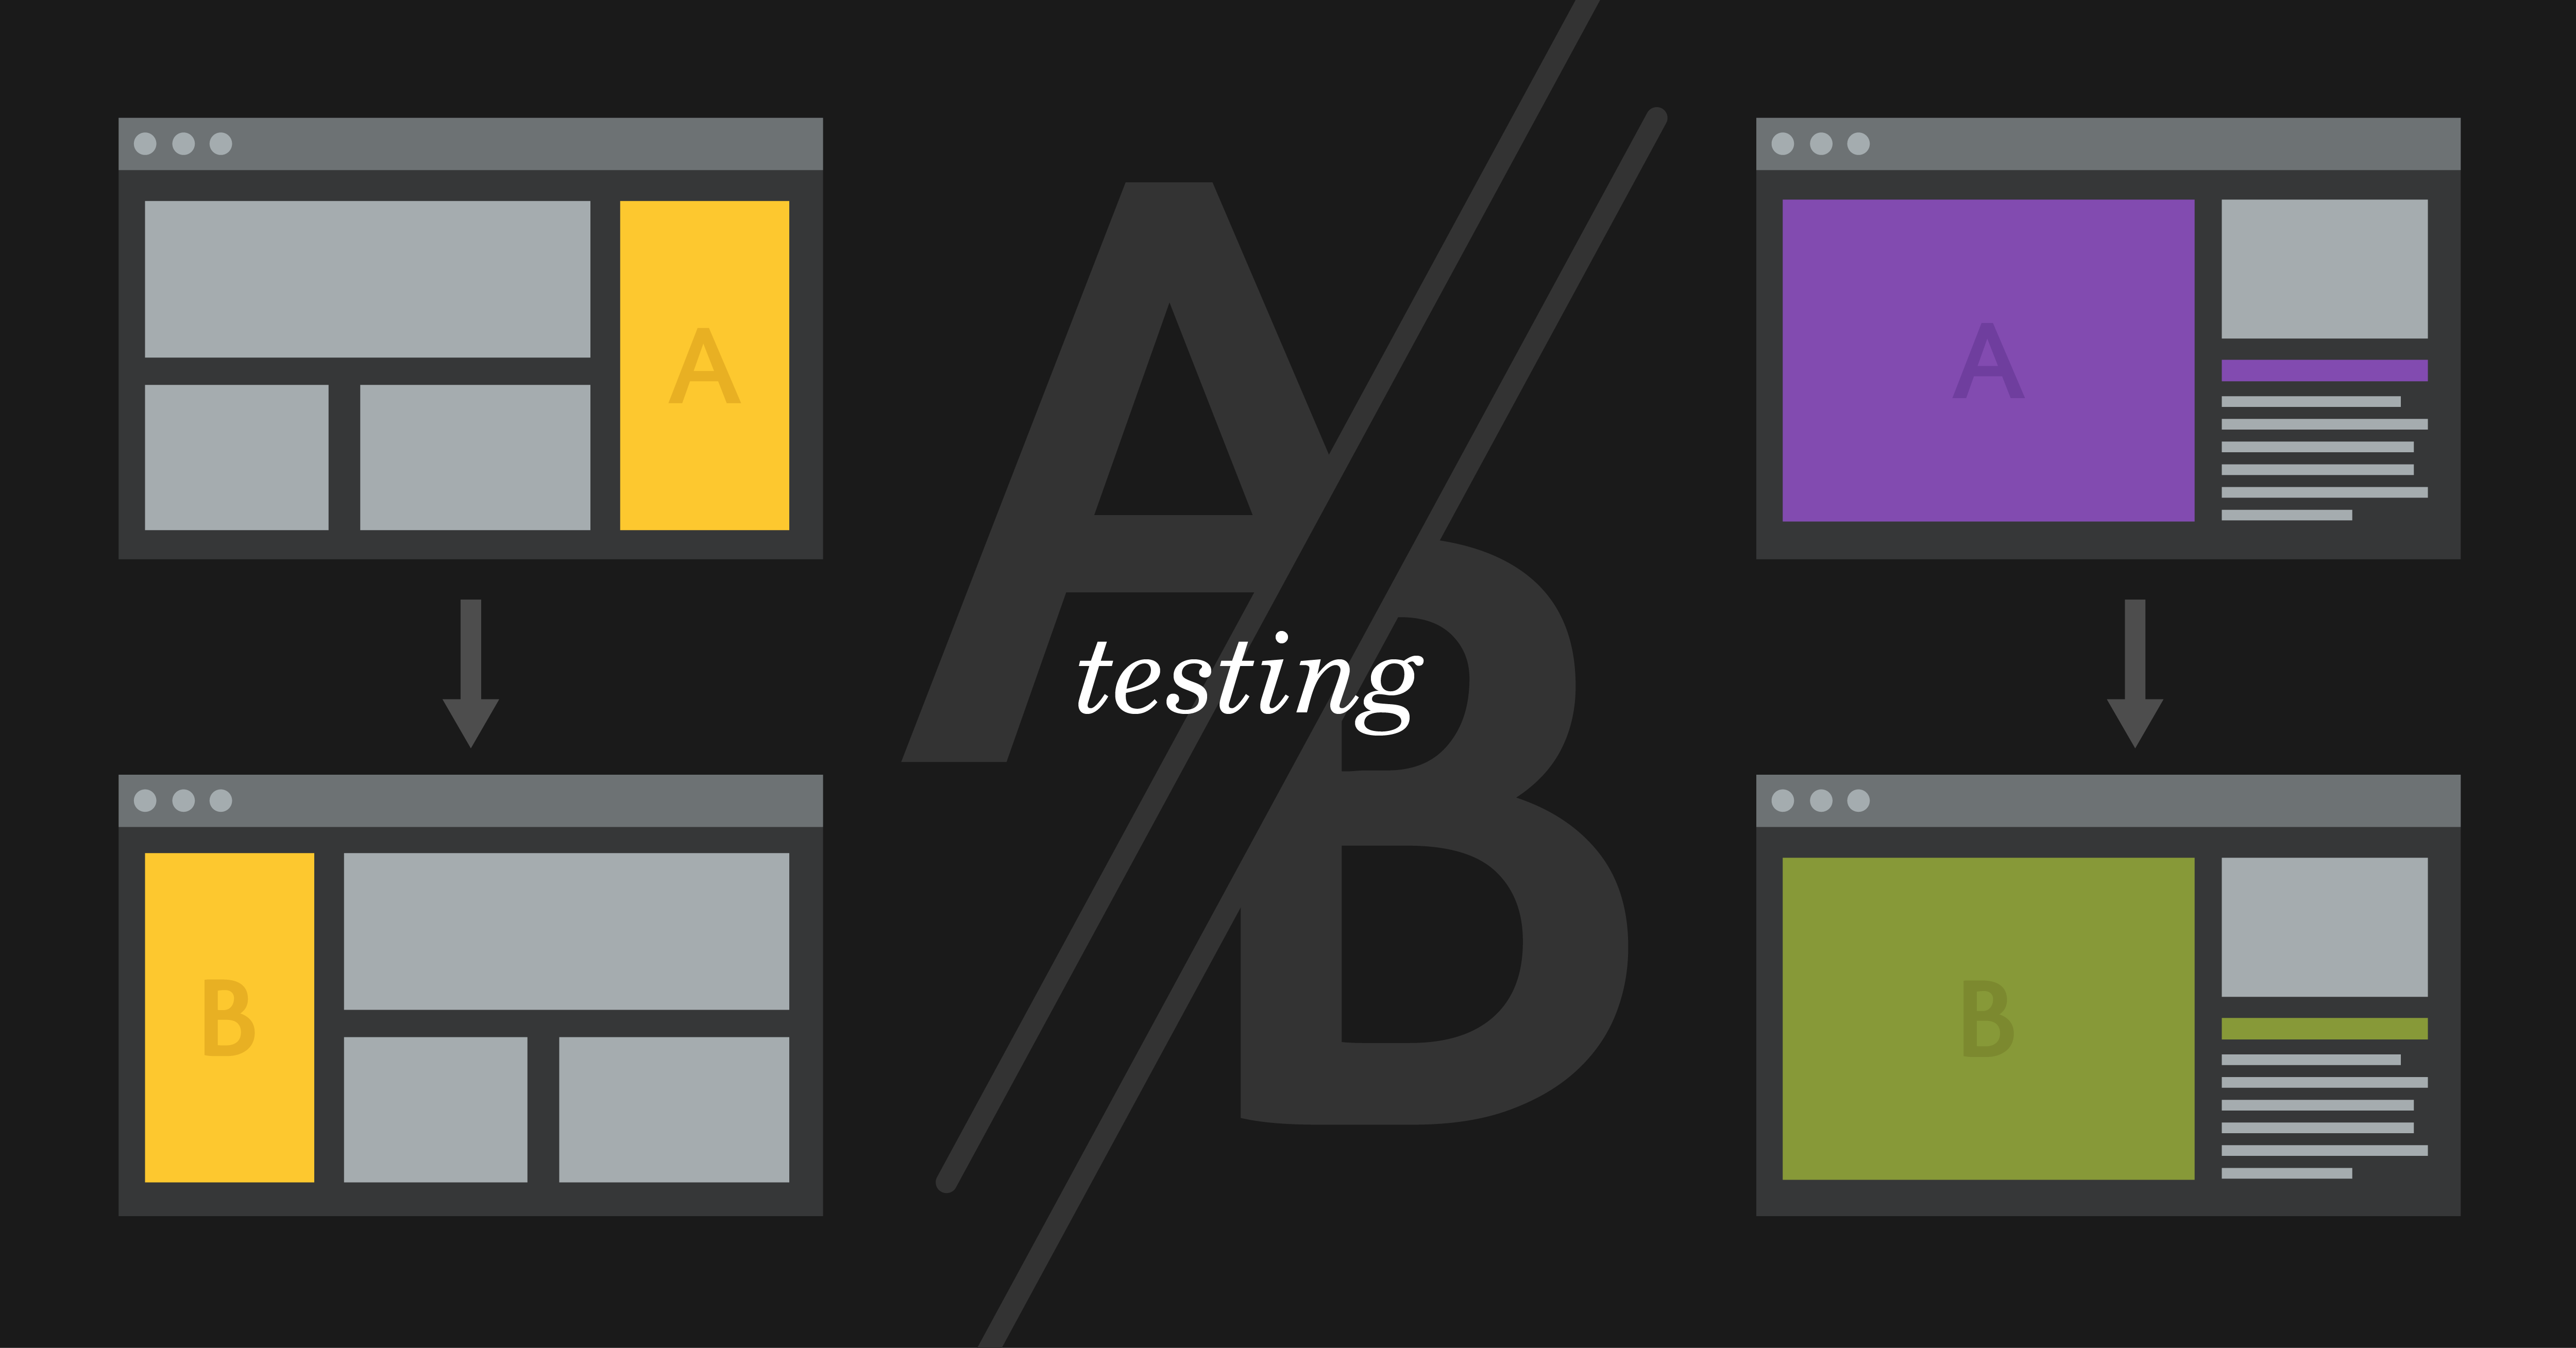 Blog_AB_Testing_TEST-01.png